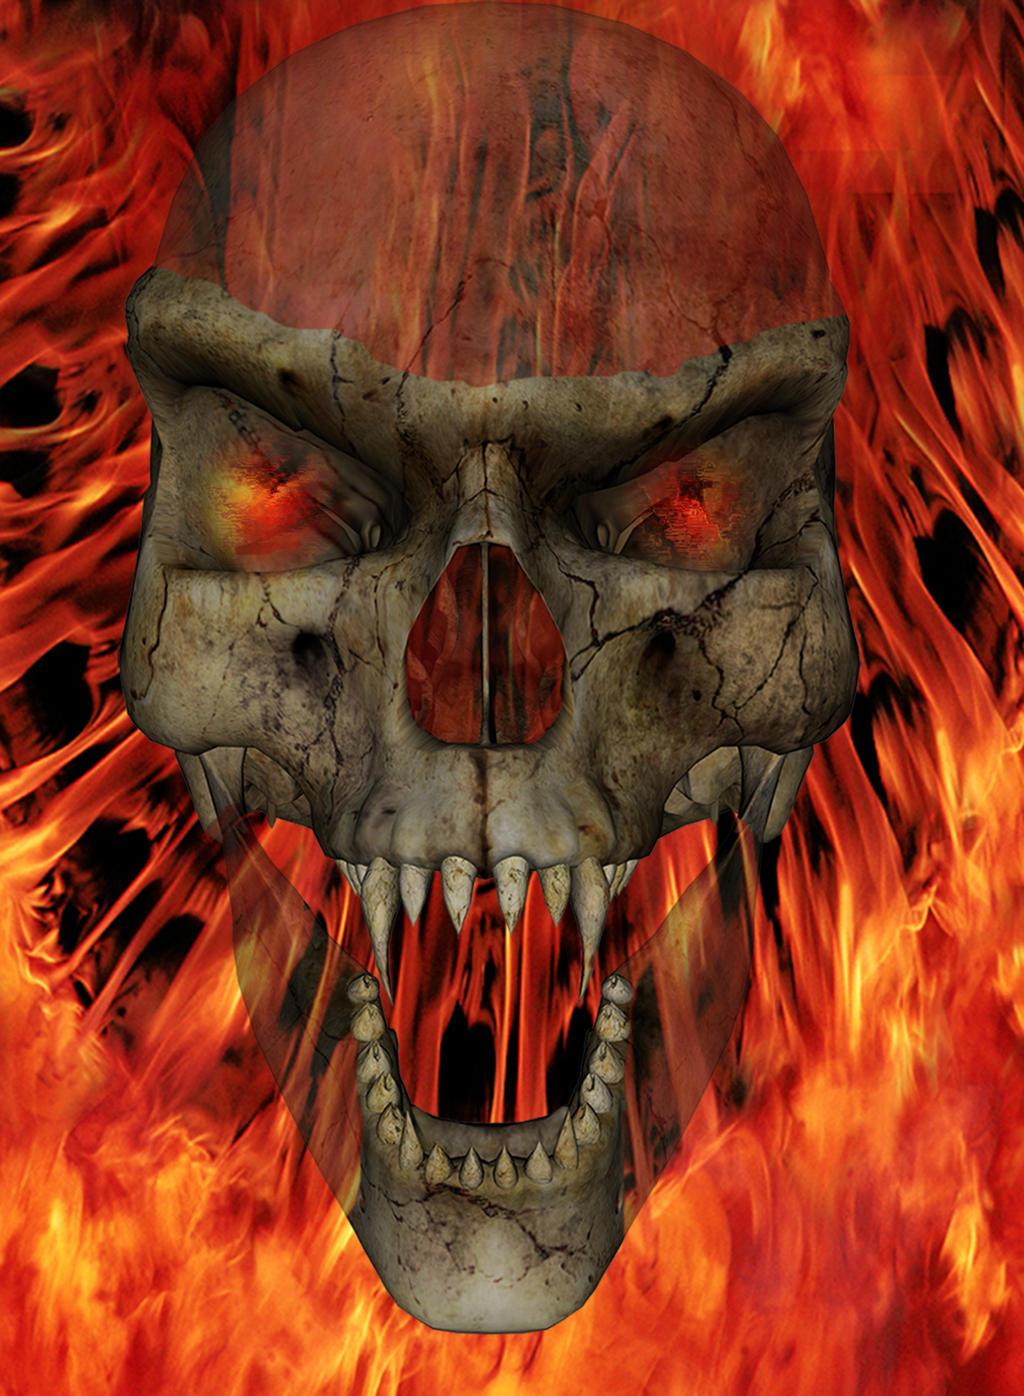 Flaming Skull by dmccoy1693